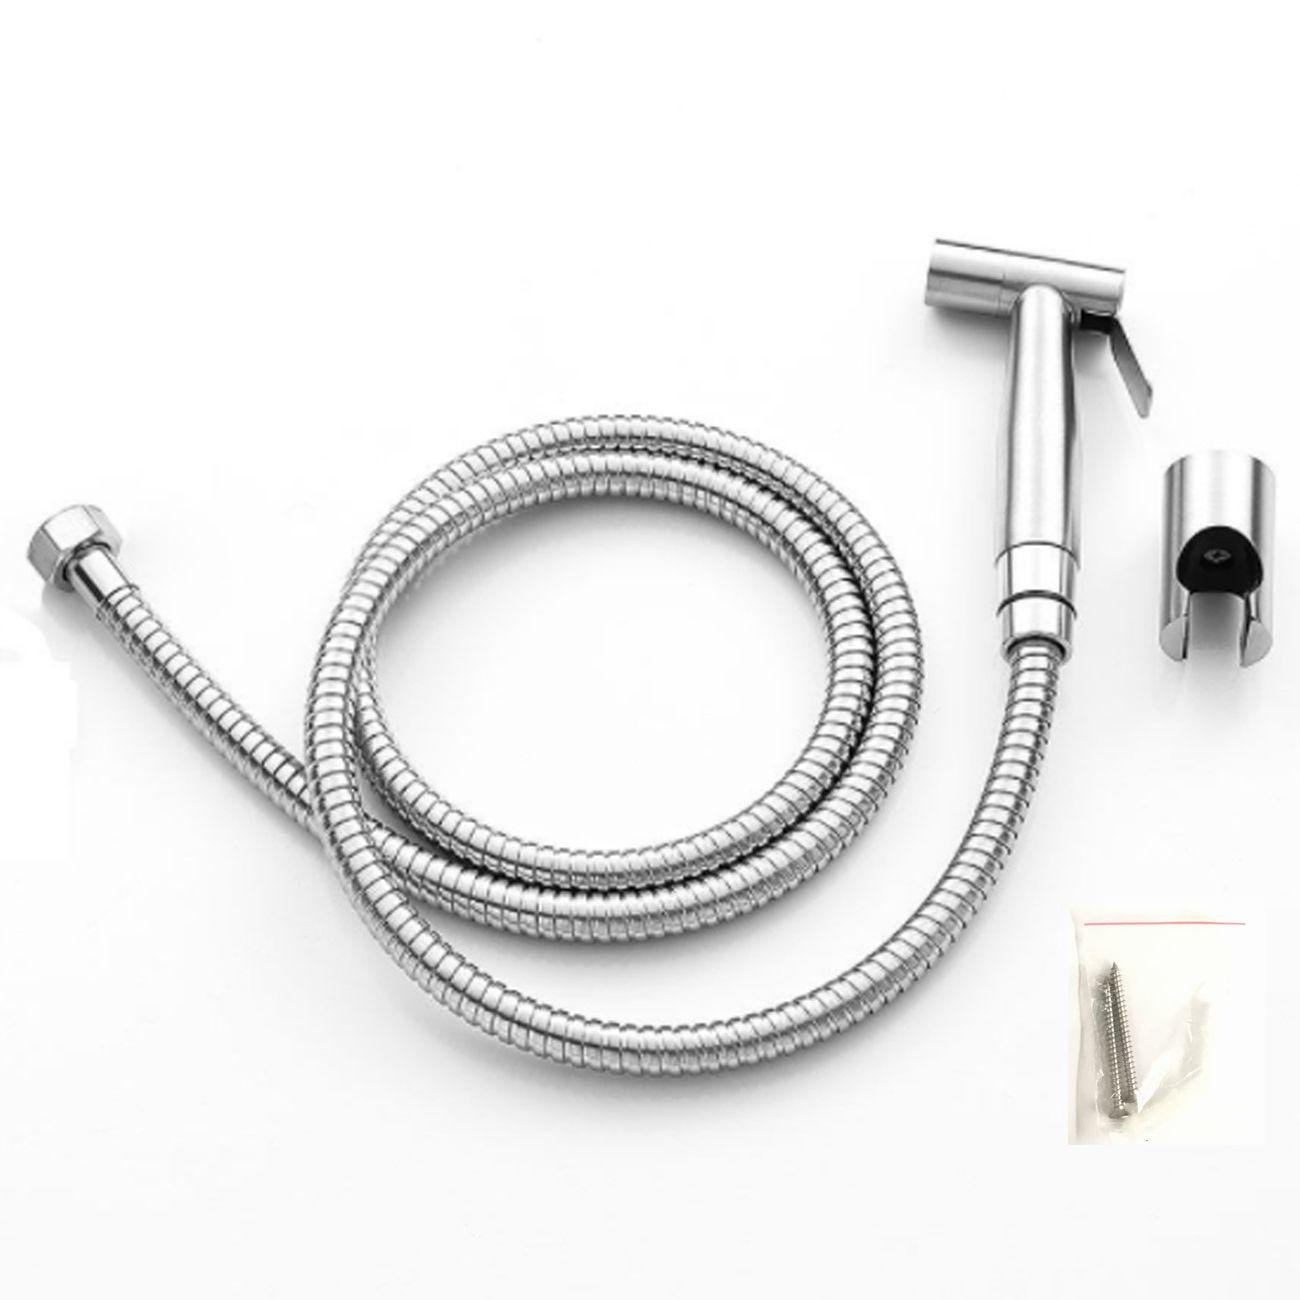 Bathroom Hand Held Toilet Bidet Sprayer Douche Shattaf Shower Spray & Wall Bracket Holder & 1.5m Hose SUS 304 Stainless Steel Cleaner Tool